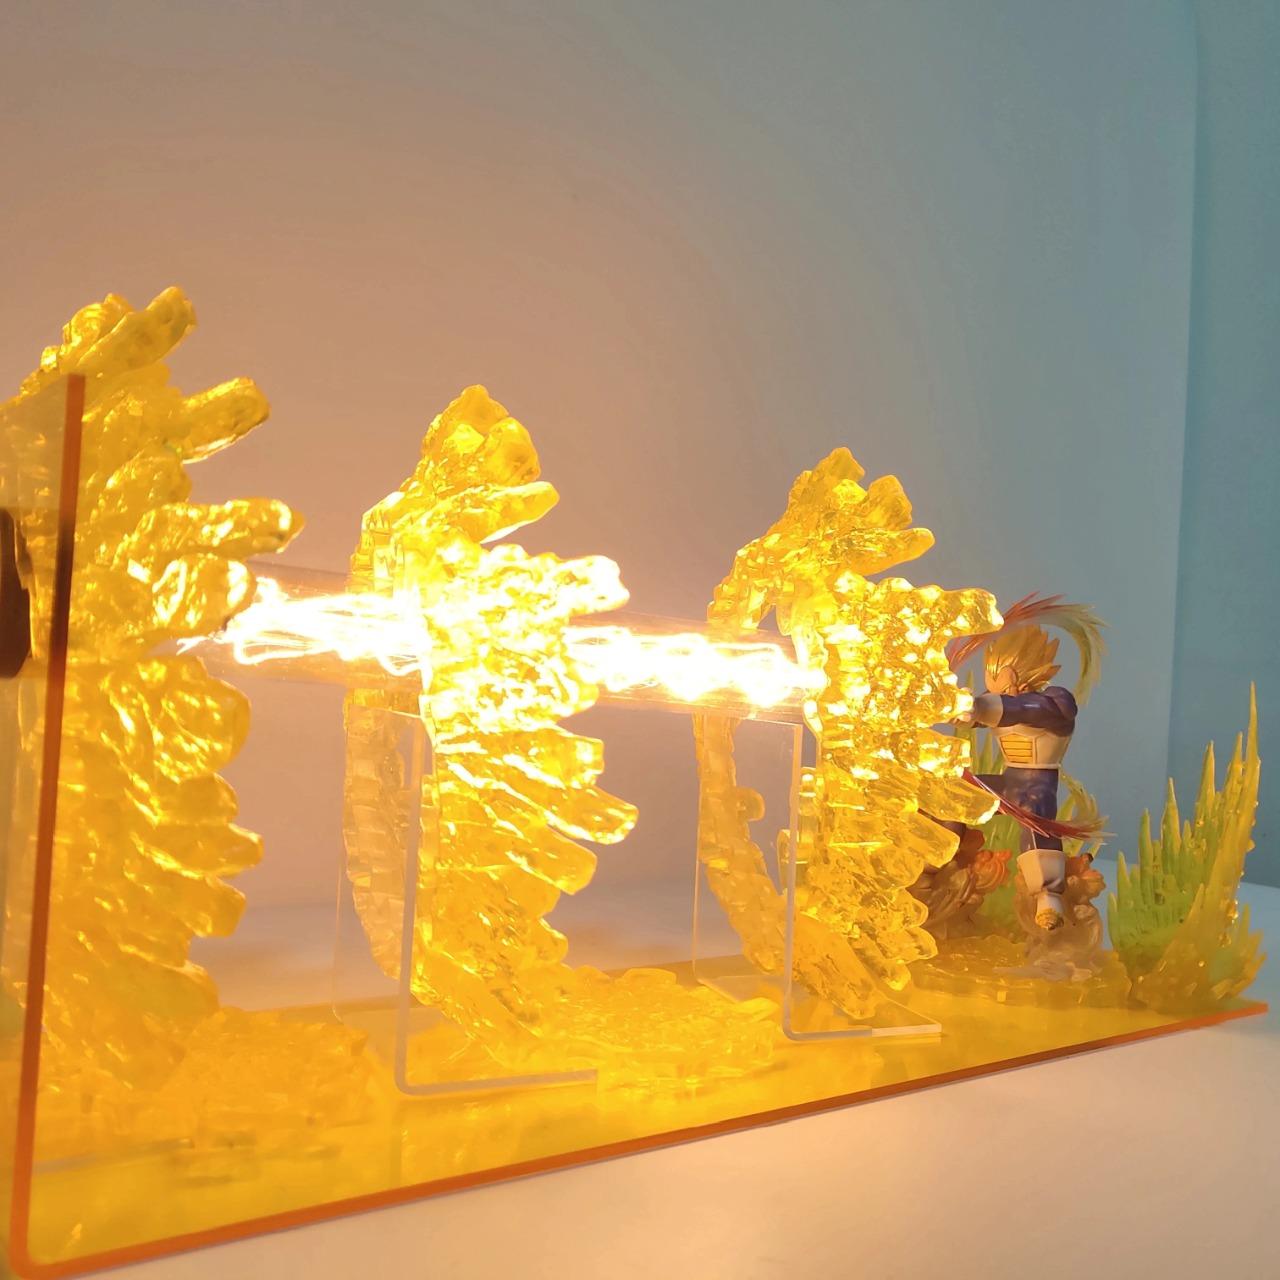 Luminária/Abajur Vegeta: Dragon Ball Z - EVALI